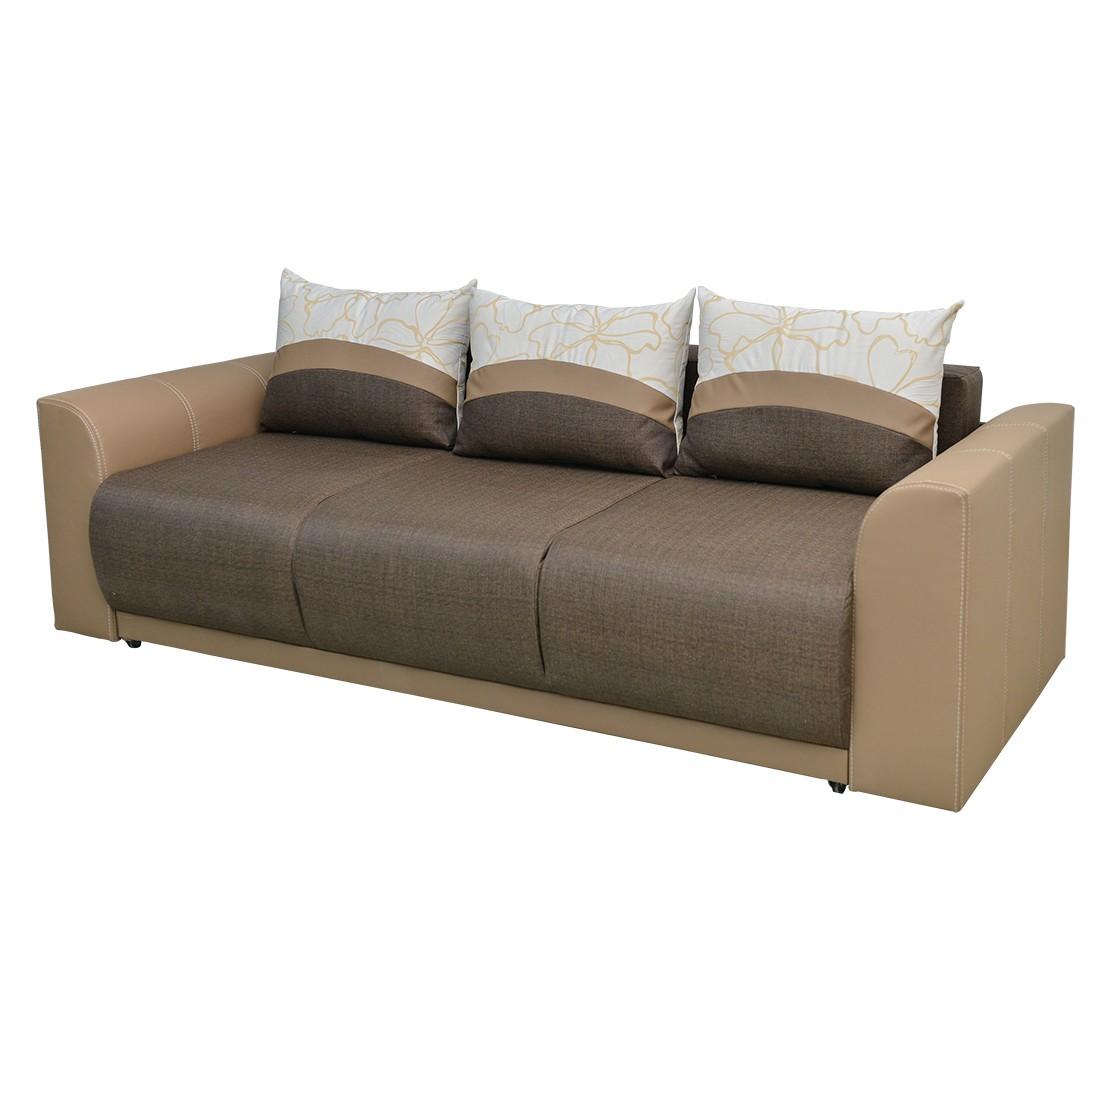 Dedeman canapea cher varianta 4 4c dedicat planurilor tale for Canapele dedeman